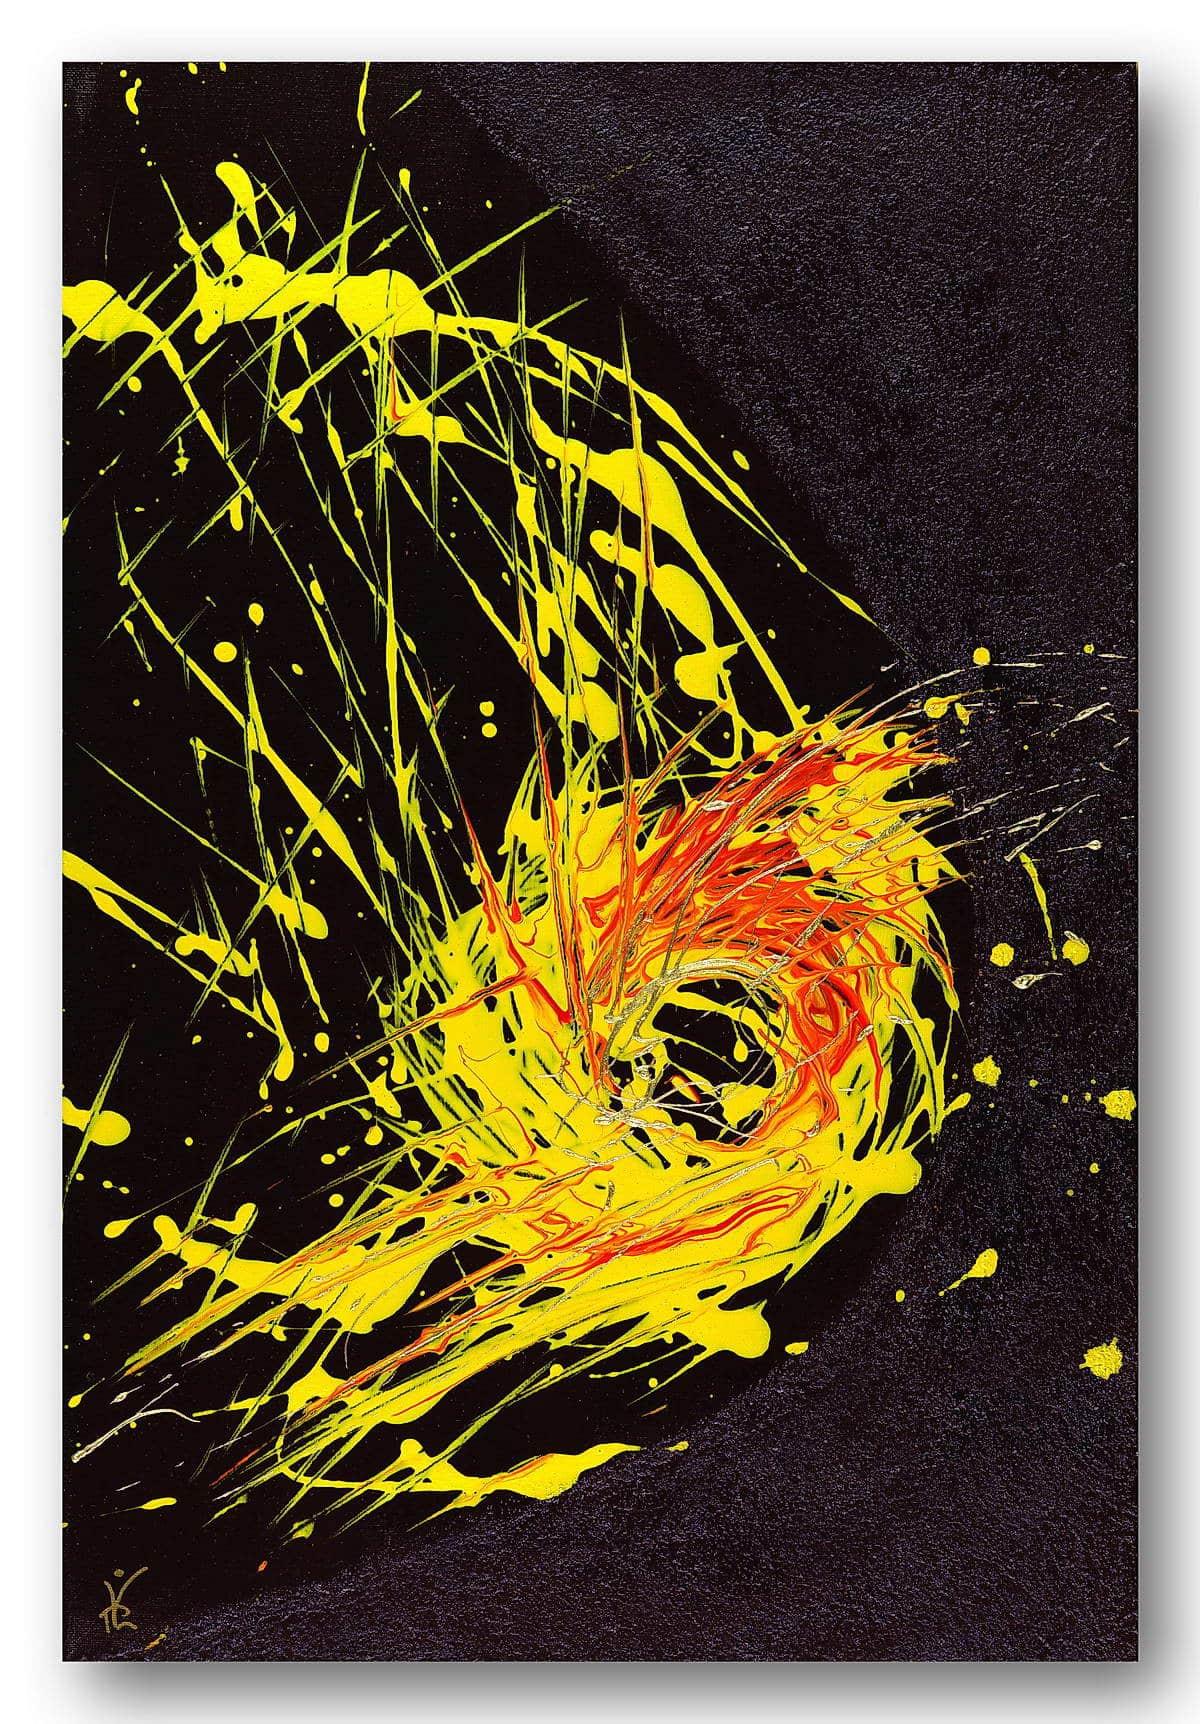 Euphoria - Acrylic / Canvas 40 x 60 cm, 15.8 x 23.6 inch